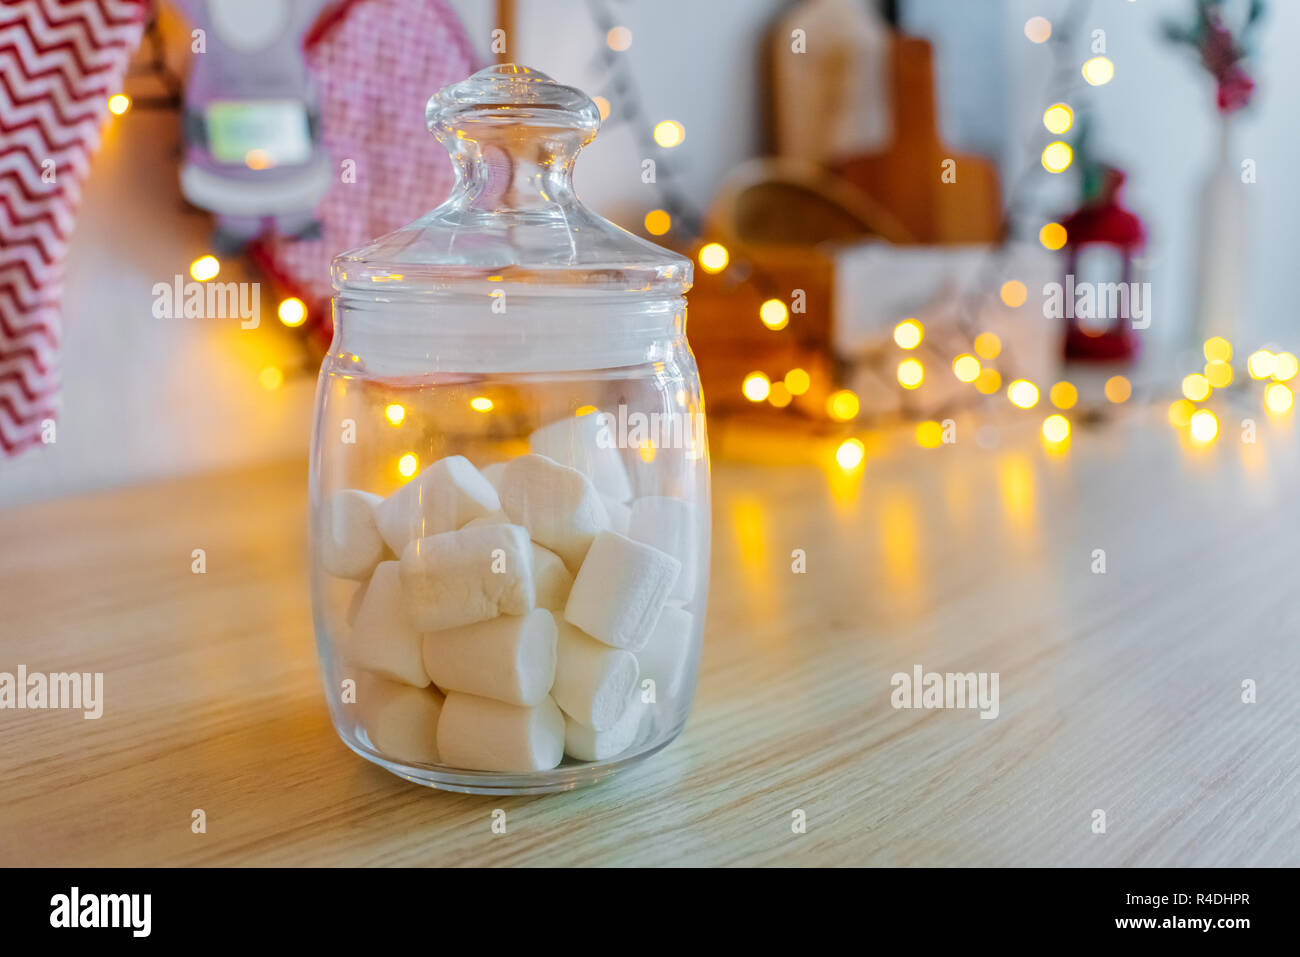 Glass Jar With White Marshmallows Christmas Decor Garland Bokeh